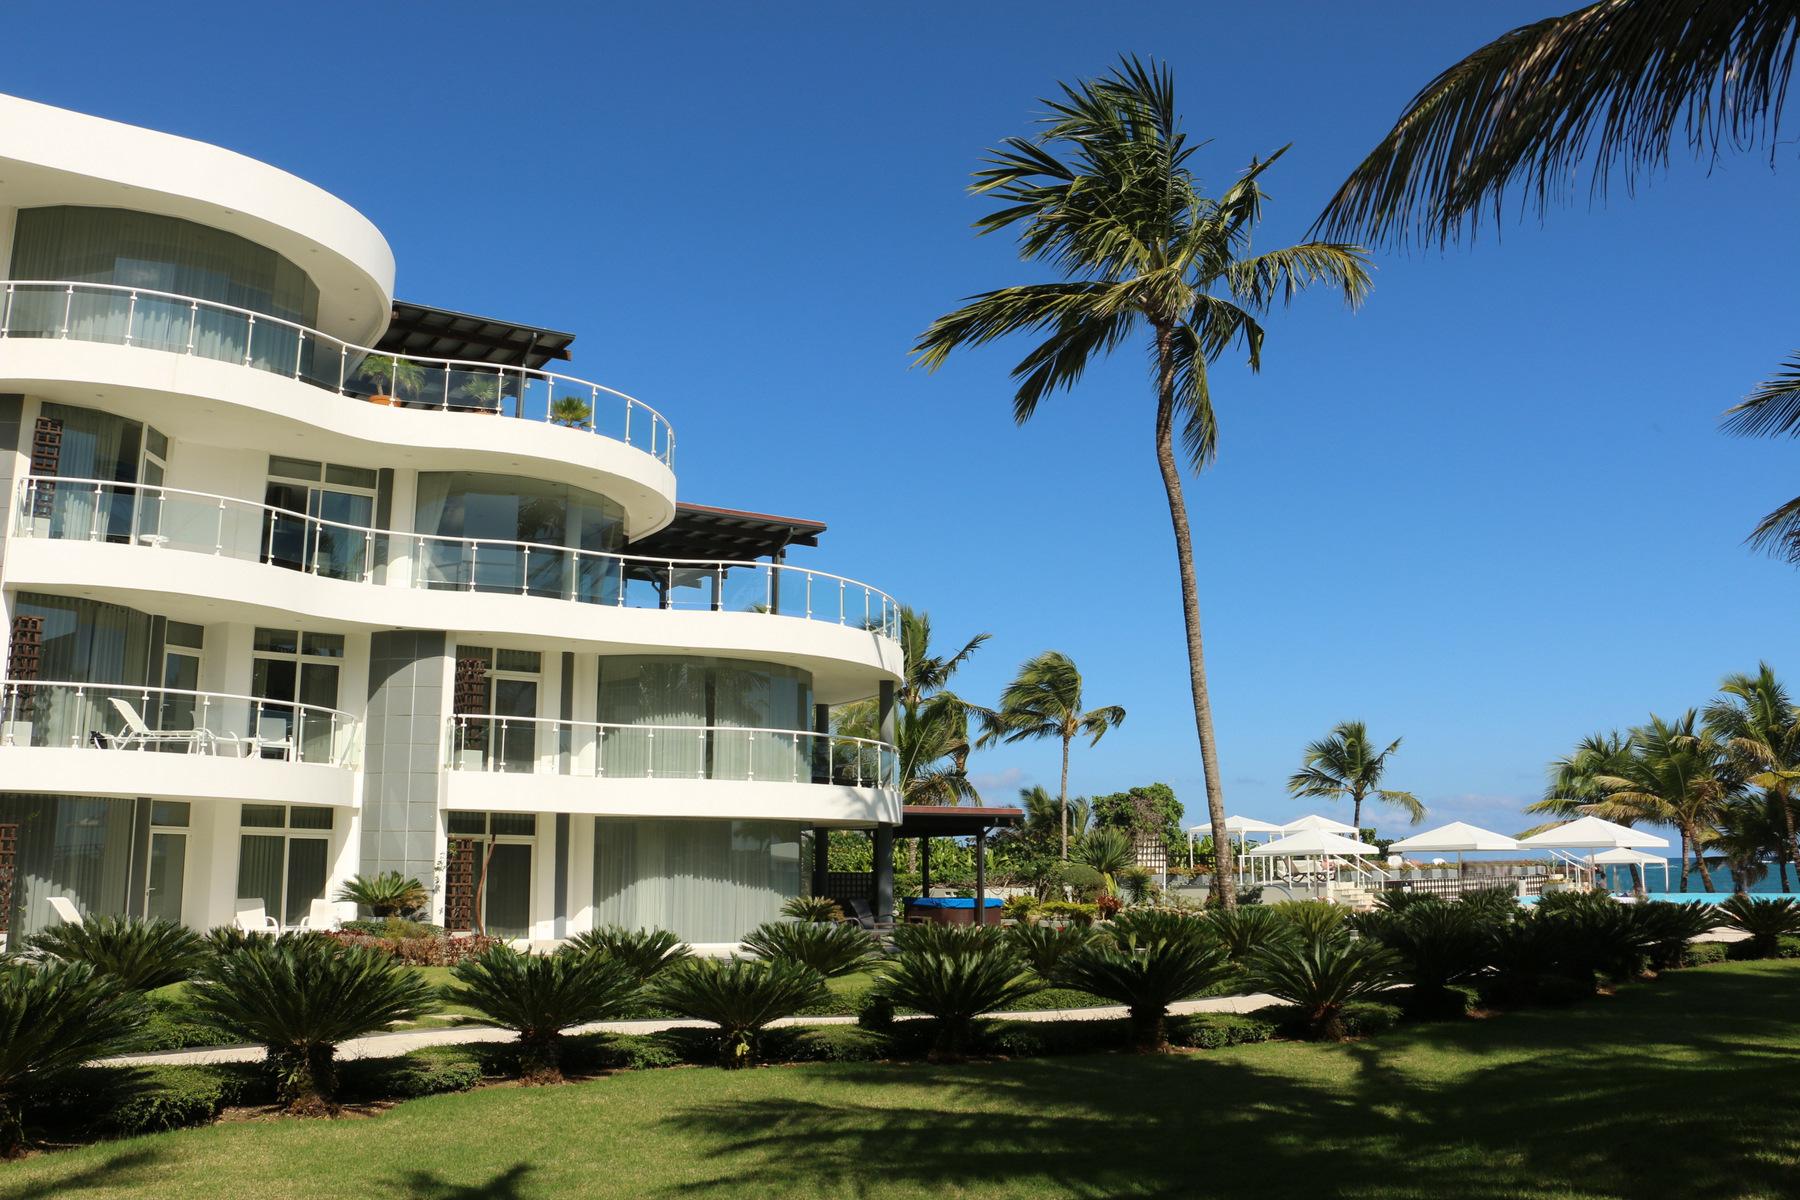 Other Residential for Sale at Millenium Resort & Spa (Hotel) Cabarete, Puerto Plata, Dominican Republic